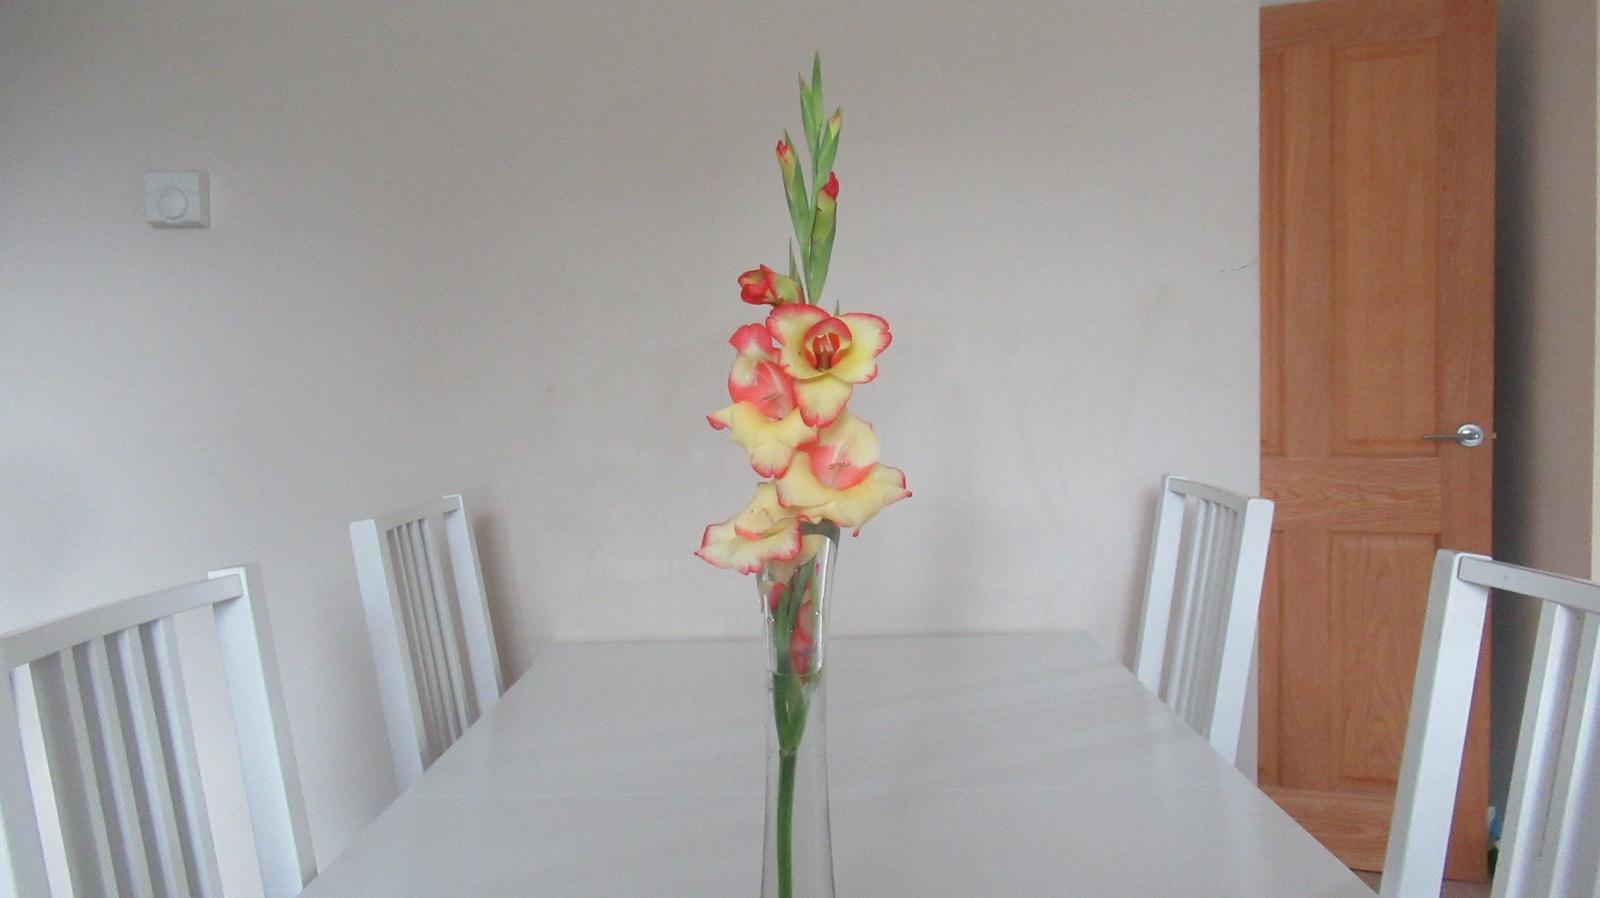 gladioli photos